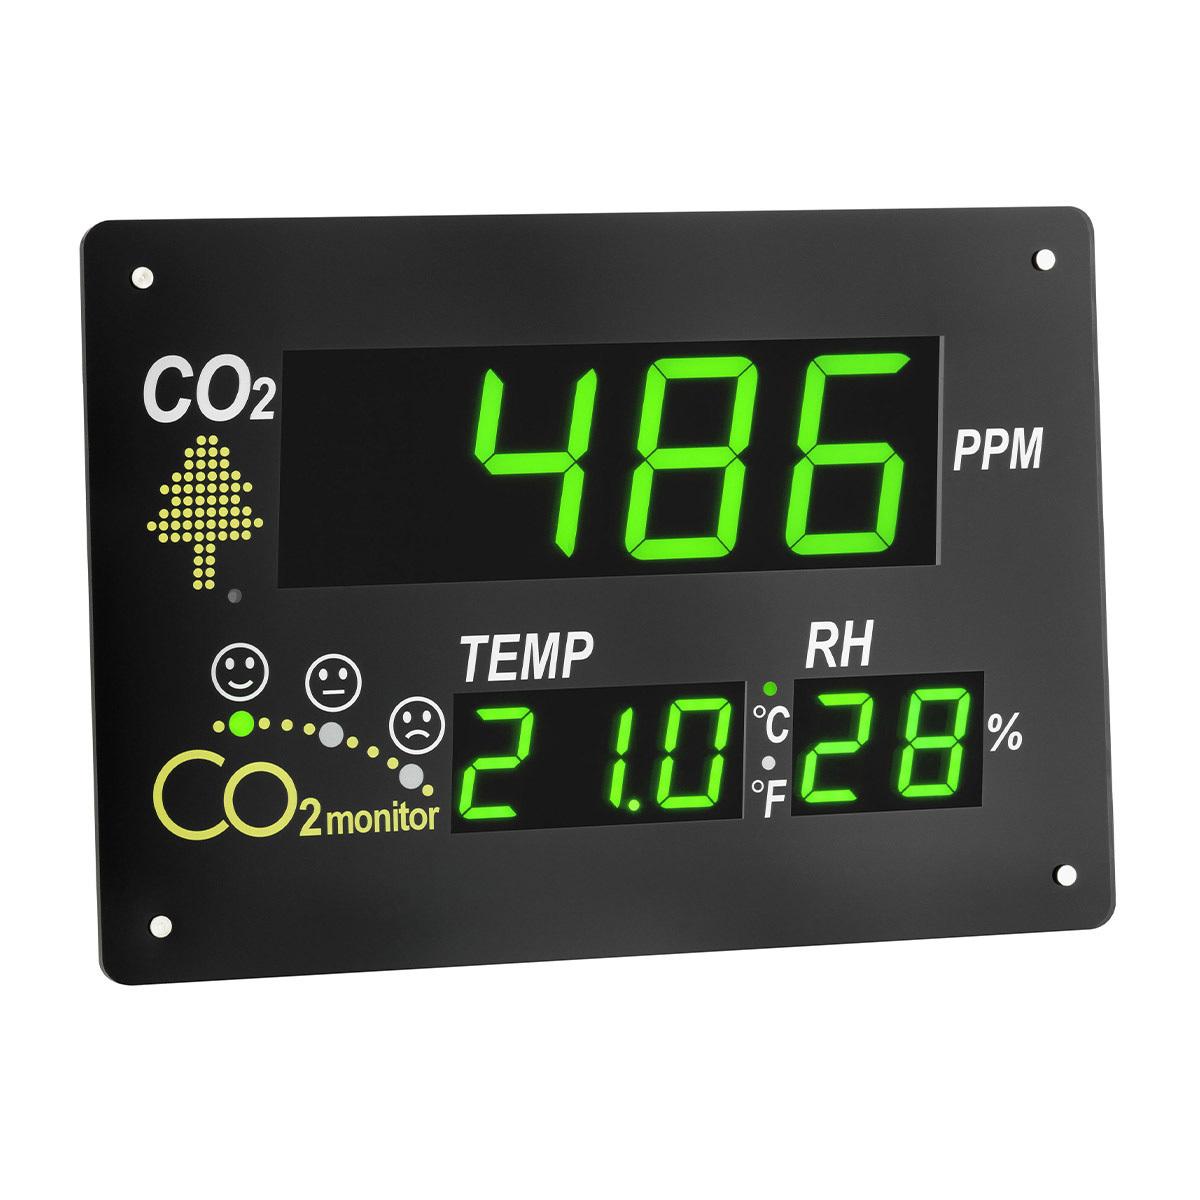 AIRCONTROL OBSERVER TFA 31.5002 CO2 MONITOR RAUMKONTROLLE 0-3000 PPM LED ZIFFER